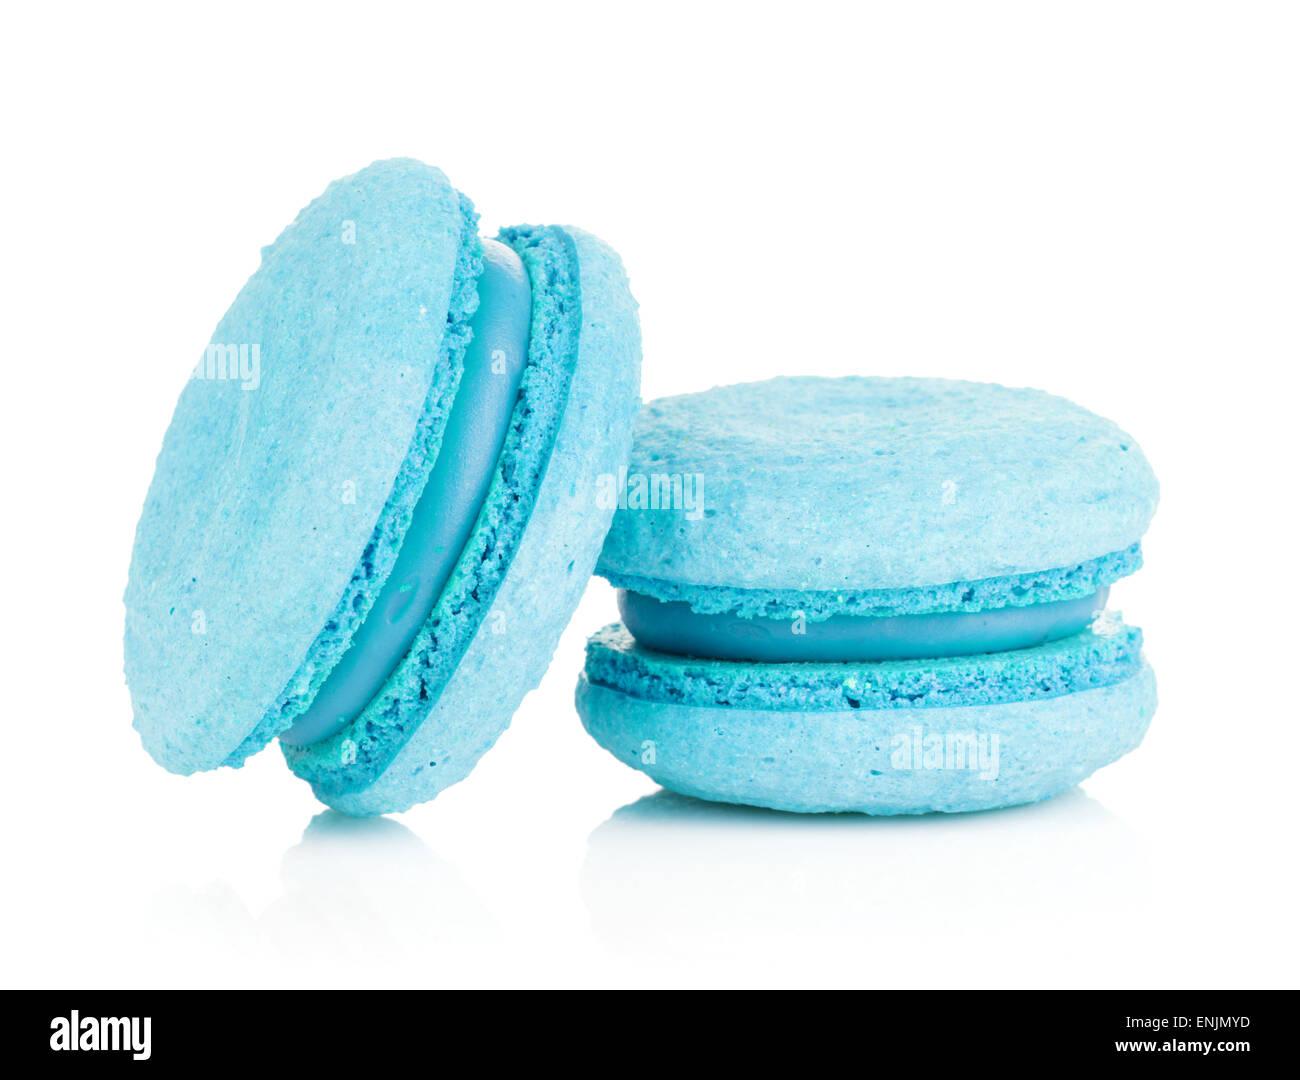 Blue macarons. Isolated on white background - Stock Image